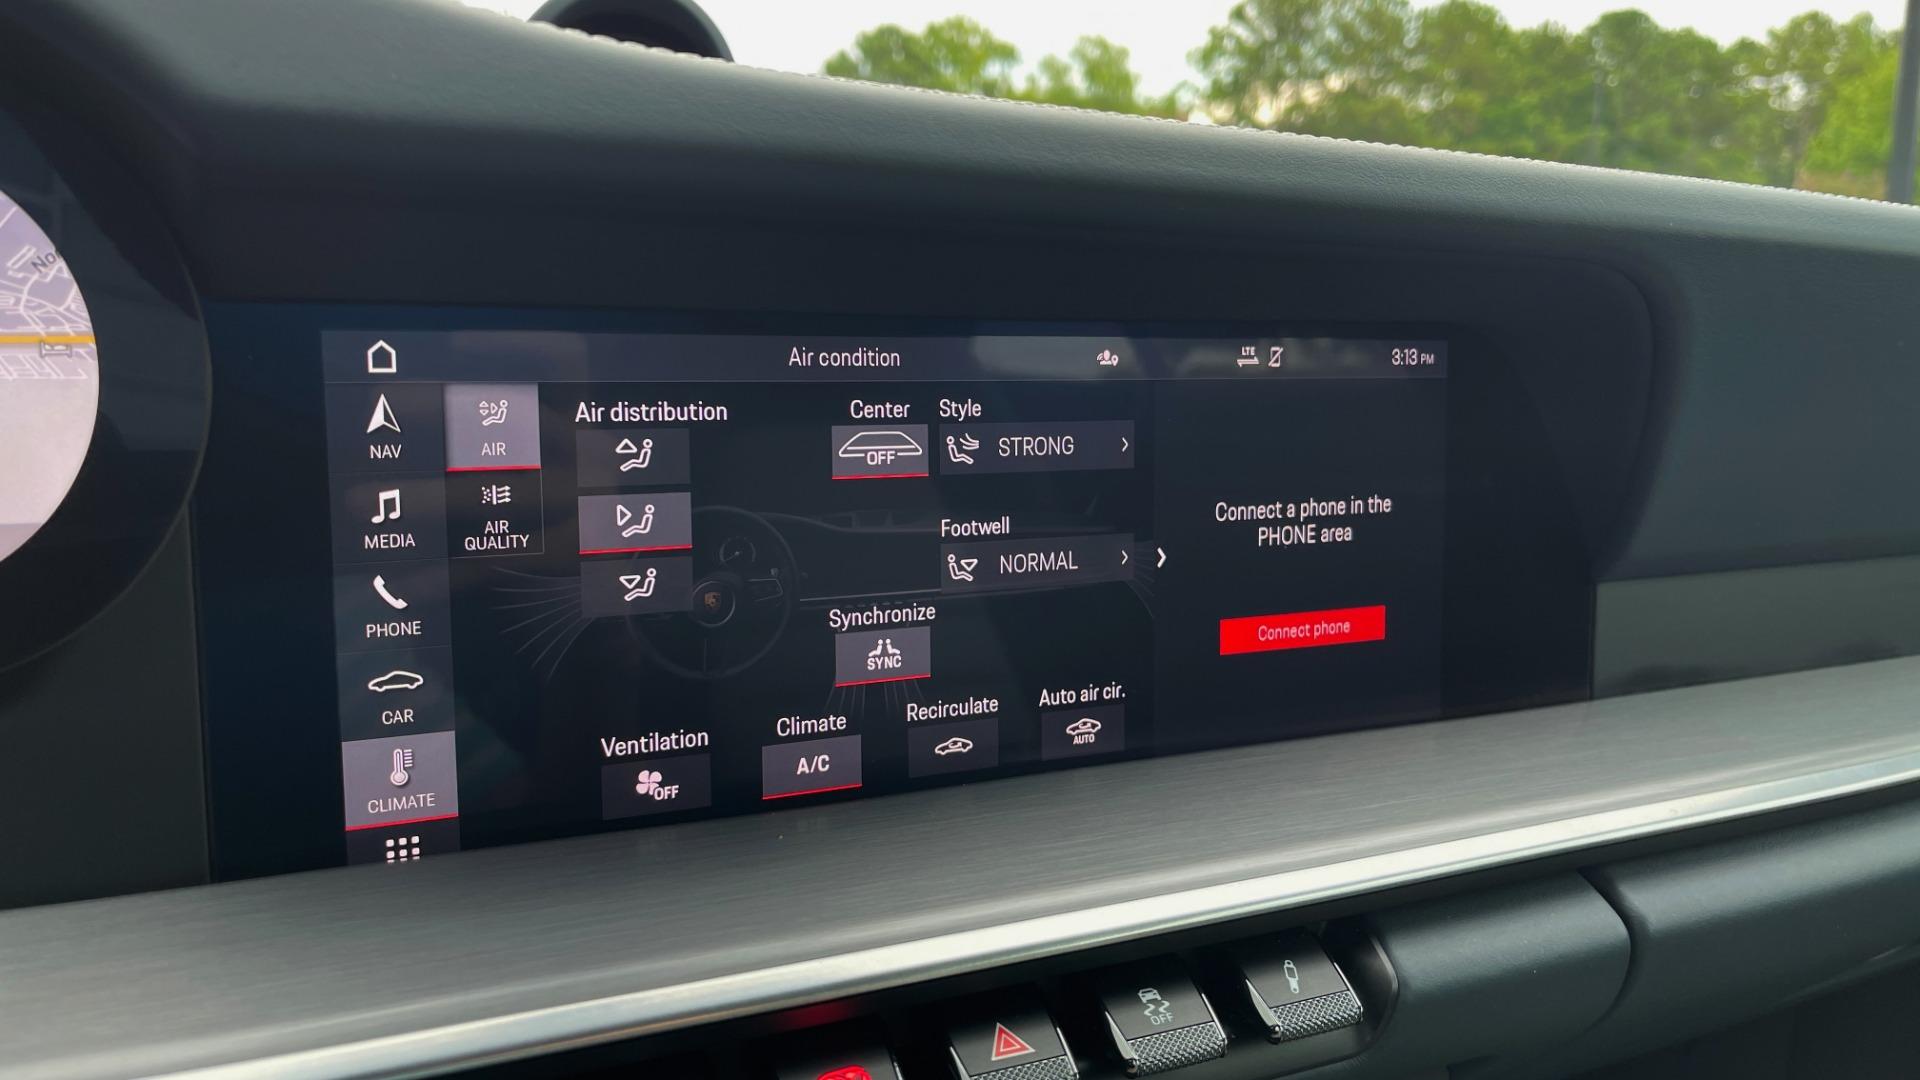 Used 2020 Porsche 911 CARRERA 4S CABRIOLET PREMIUM SPORT PKG / NAV / BOSE / LIGHT DESIGN PKG for sale $167,595 at Formula Imports in Charlotte NC 28227 60